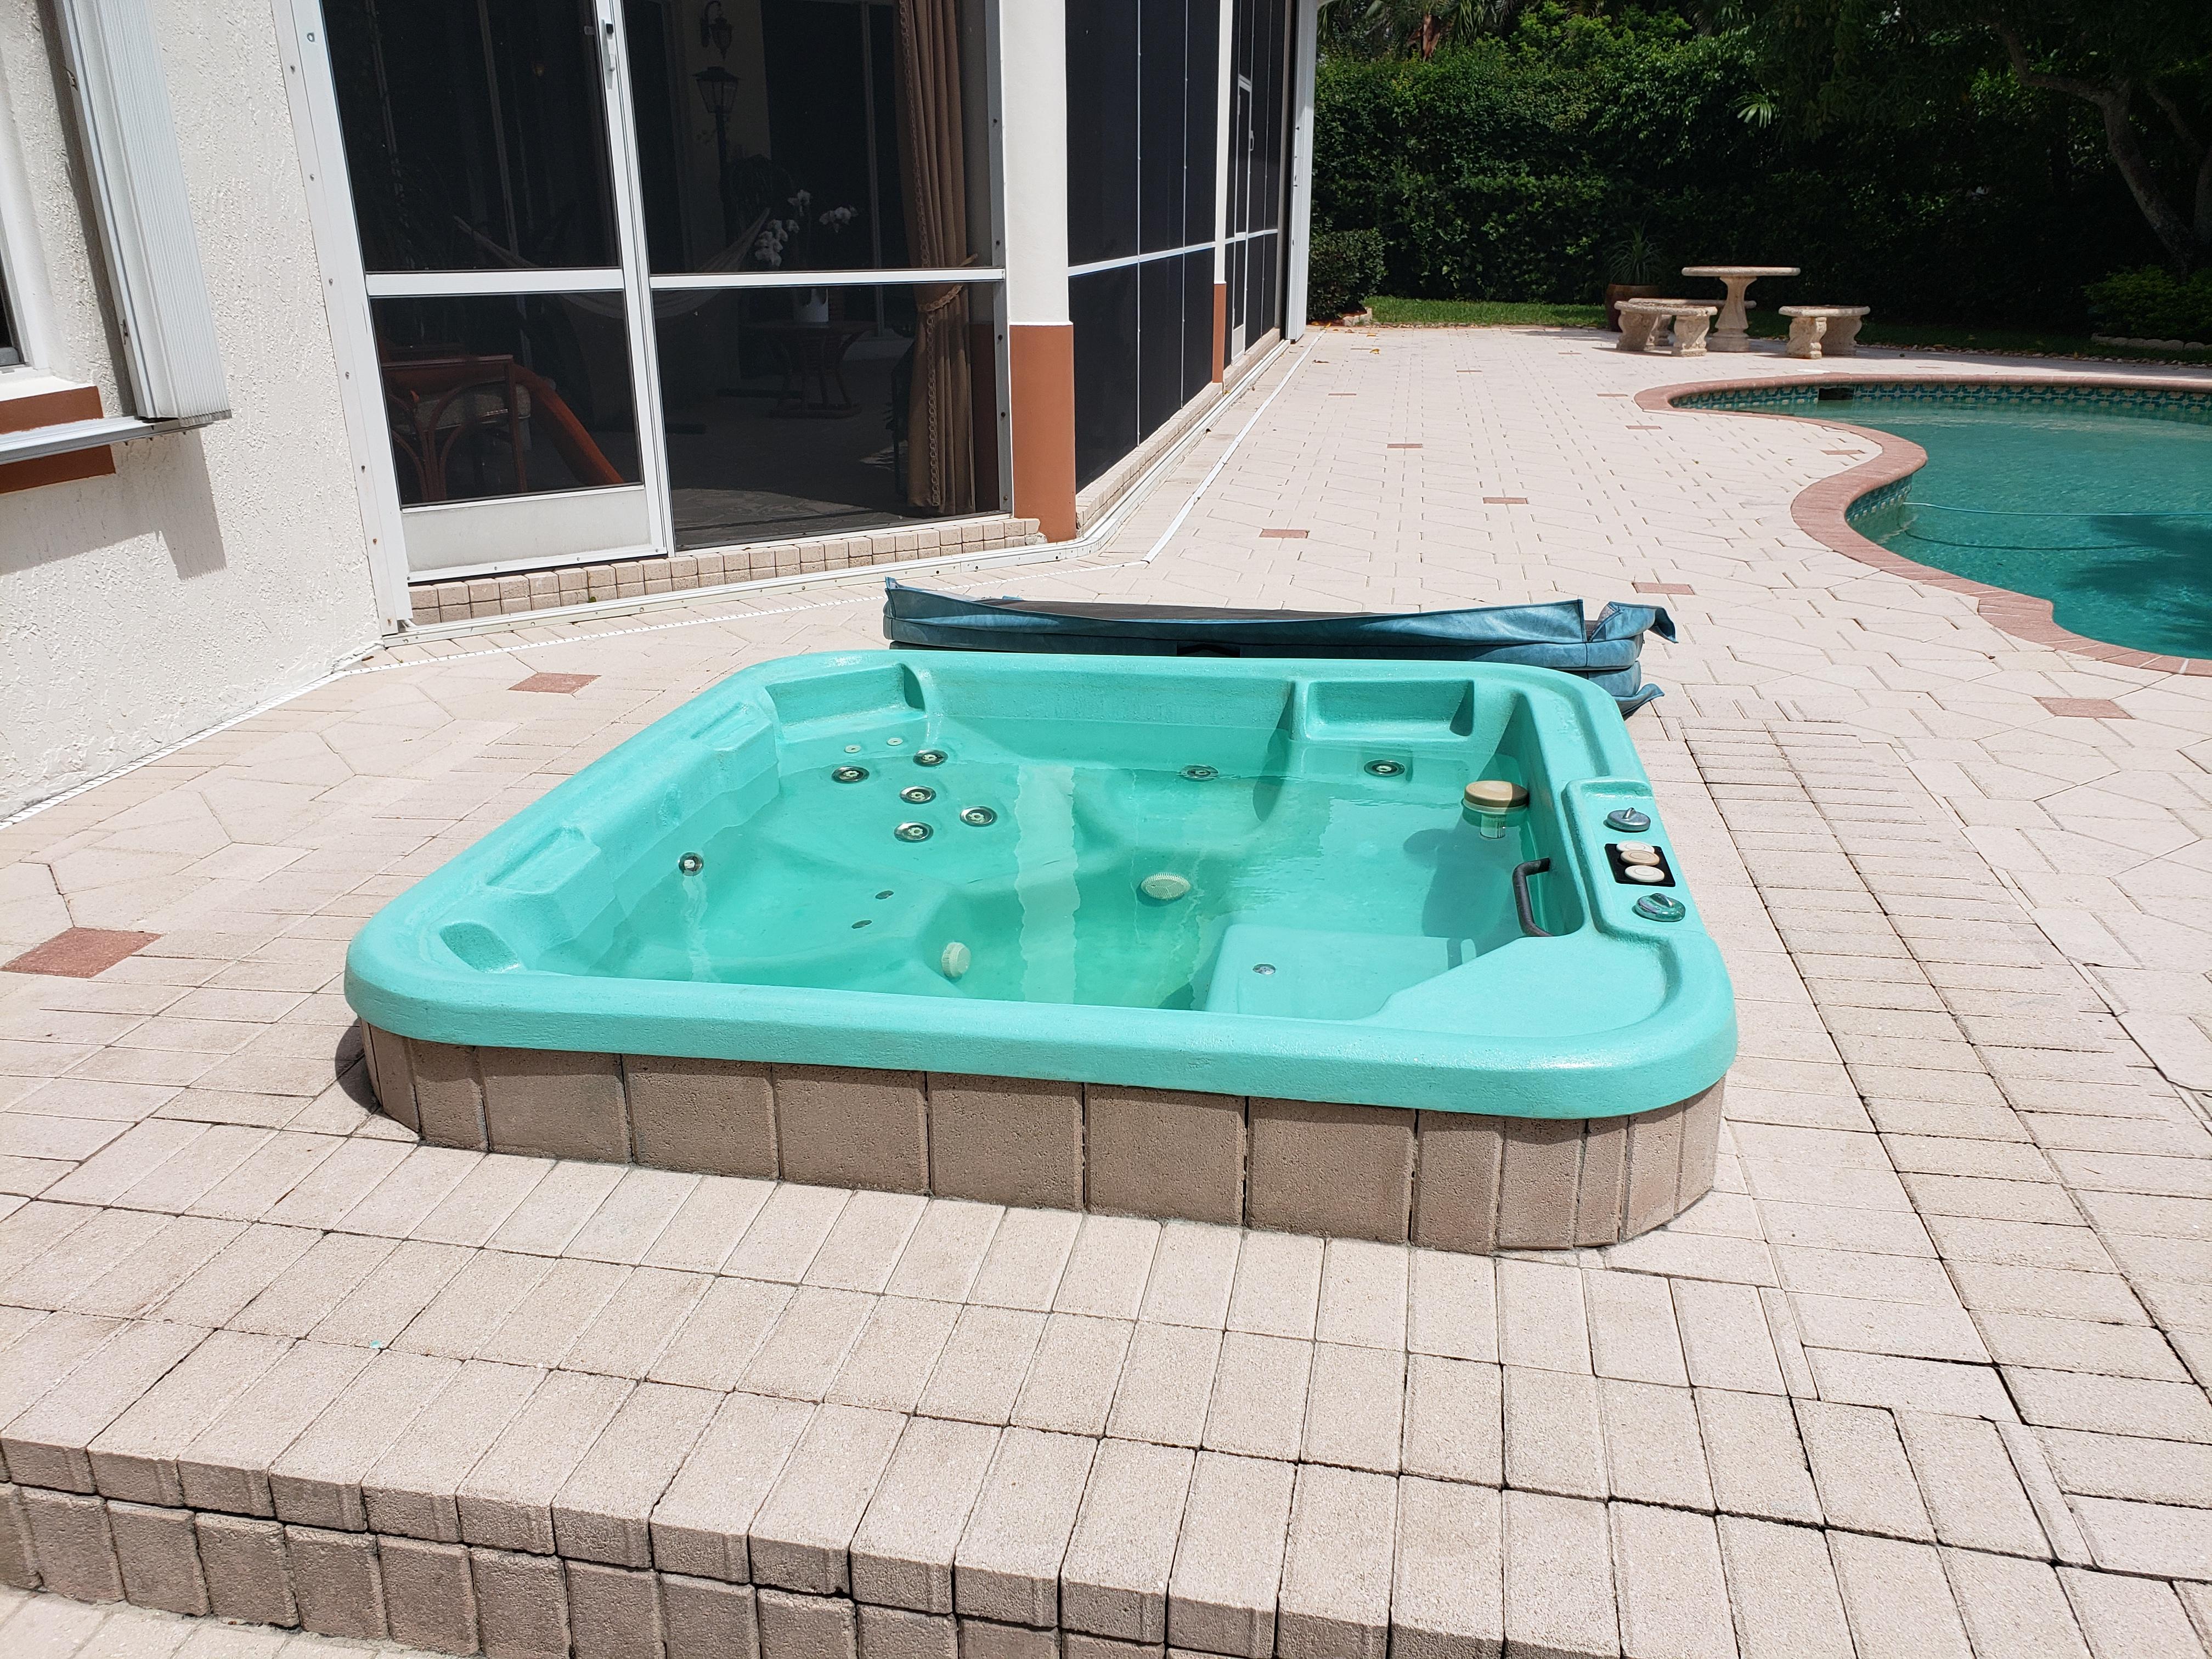 Restore Spa/Jacuzzi